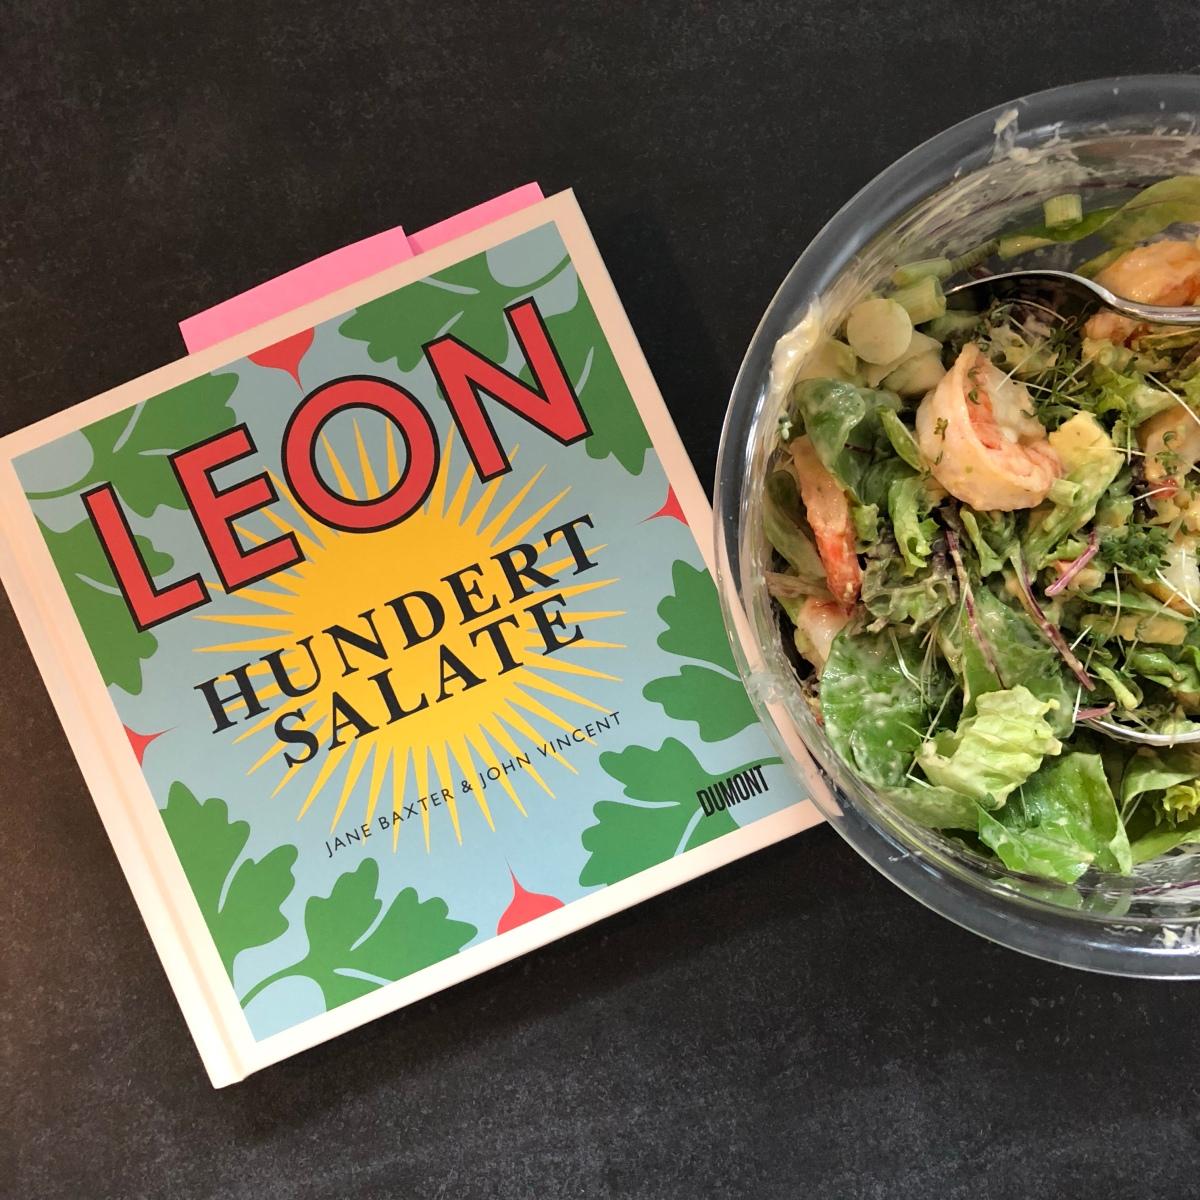 Leon - Hundert Salate